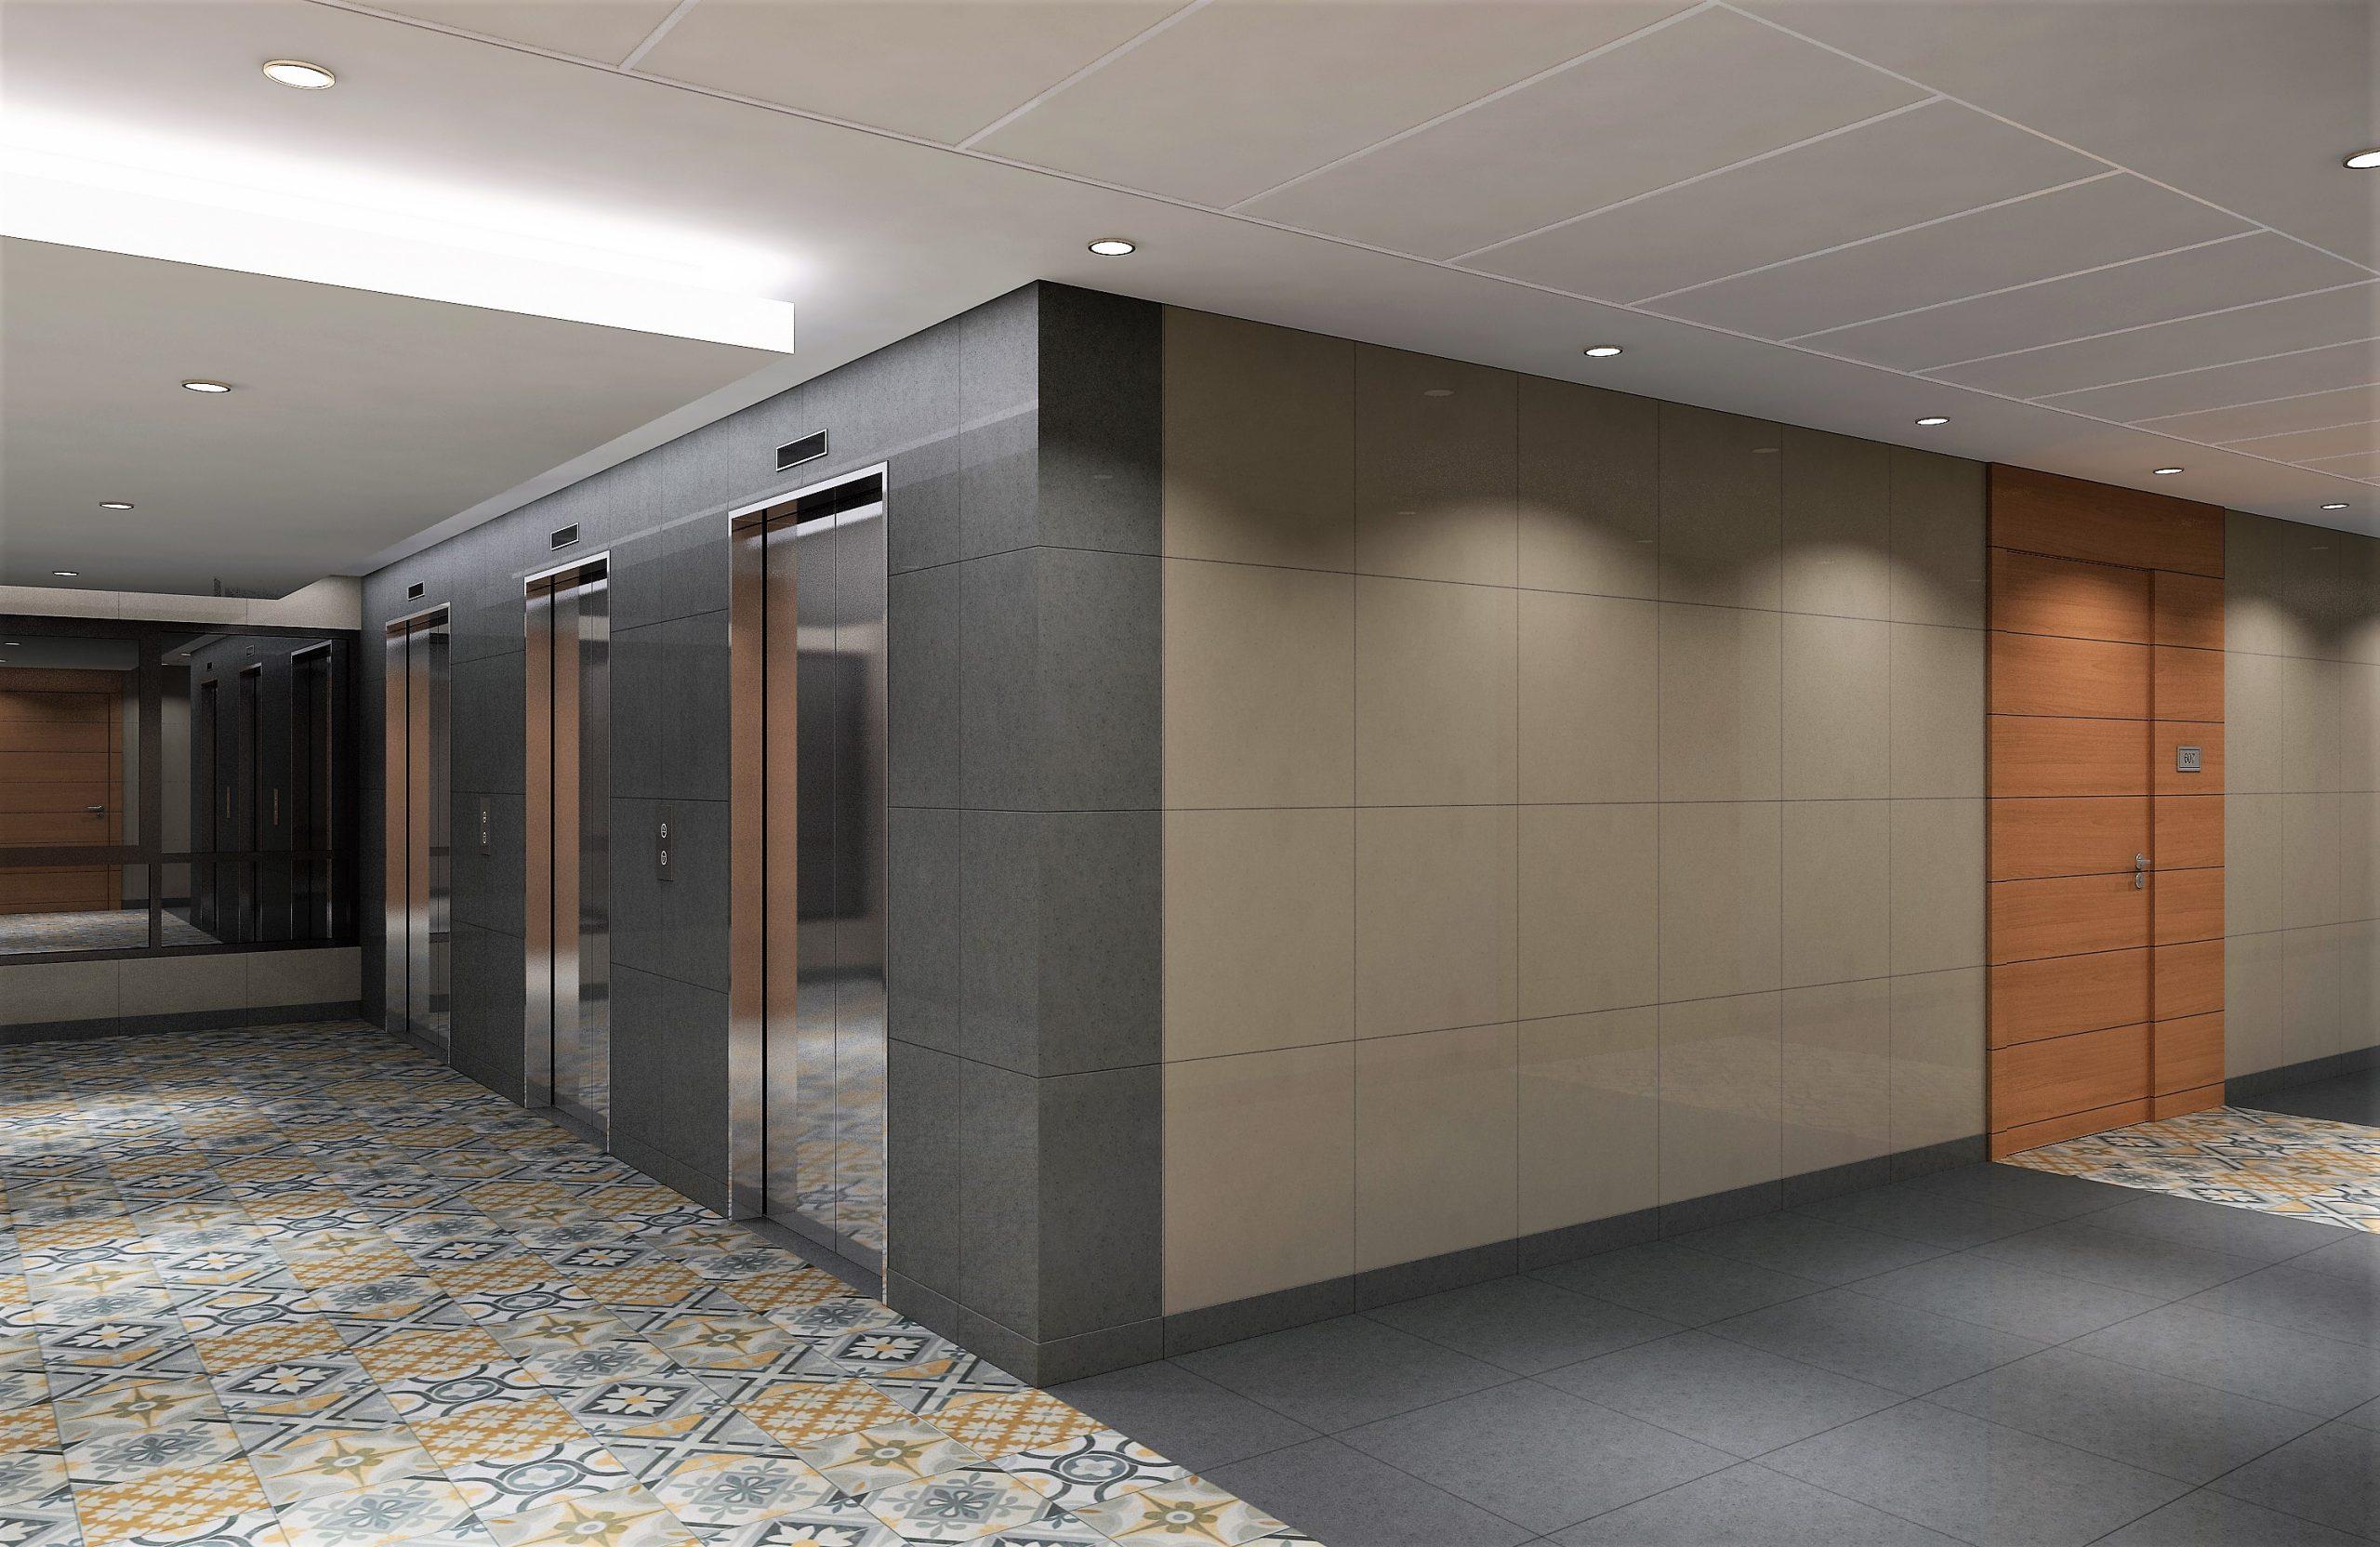 corridor-view-1-scaled.jpg